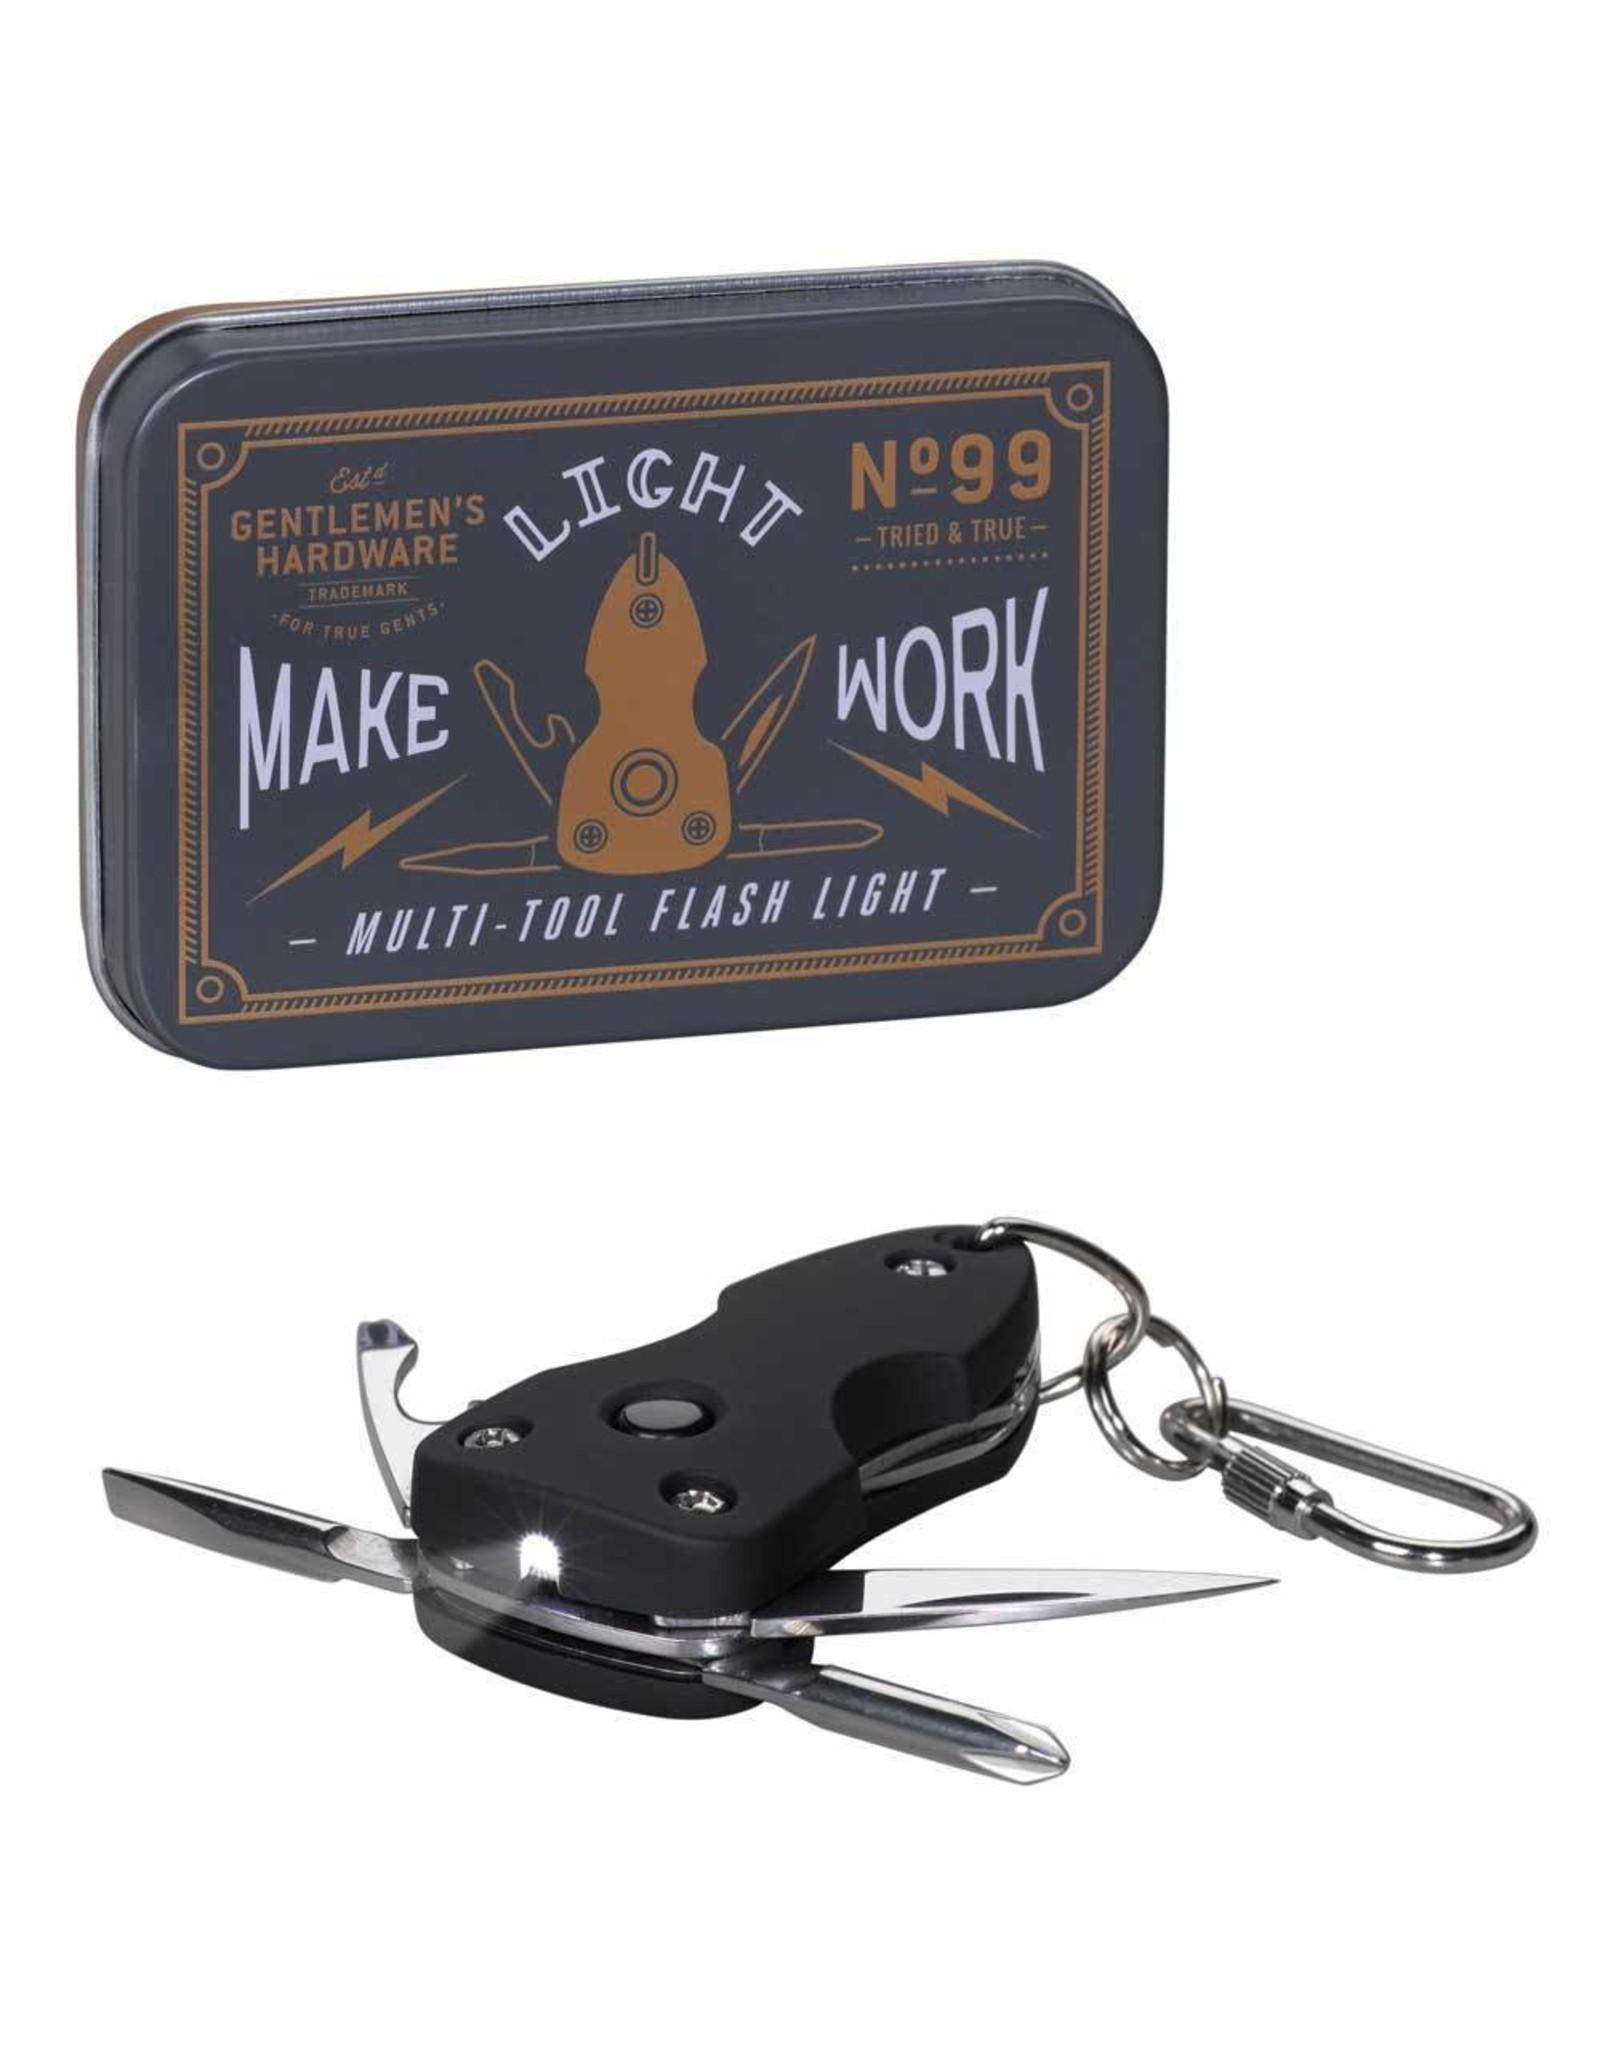 Gentleman's Hardware Pocket Multi Tool with Flashlight